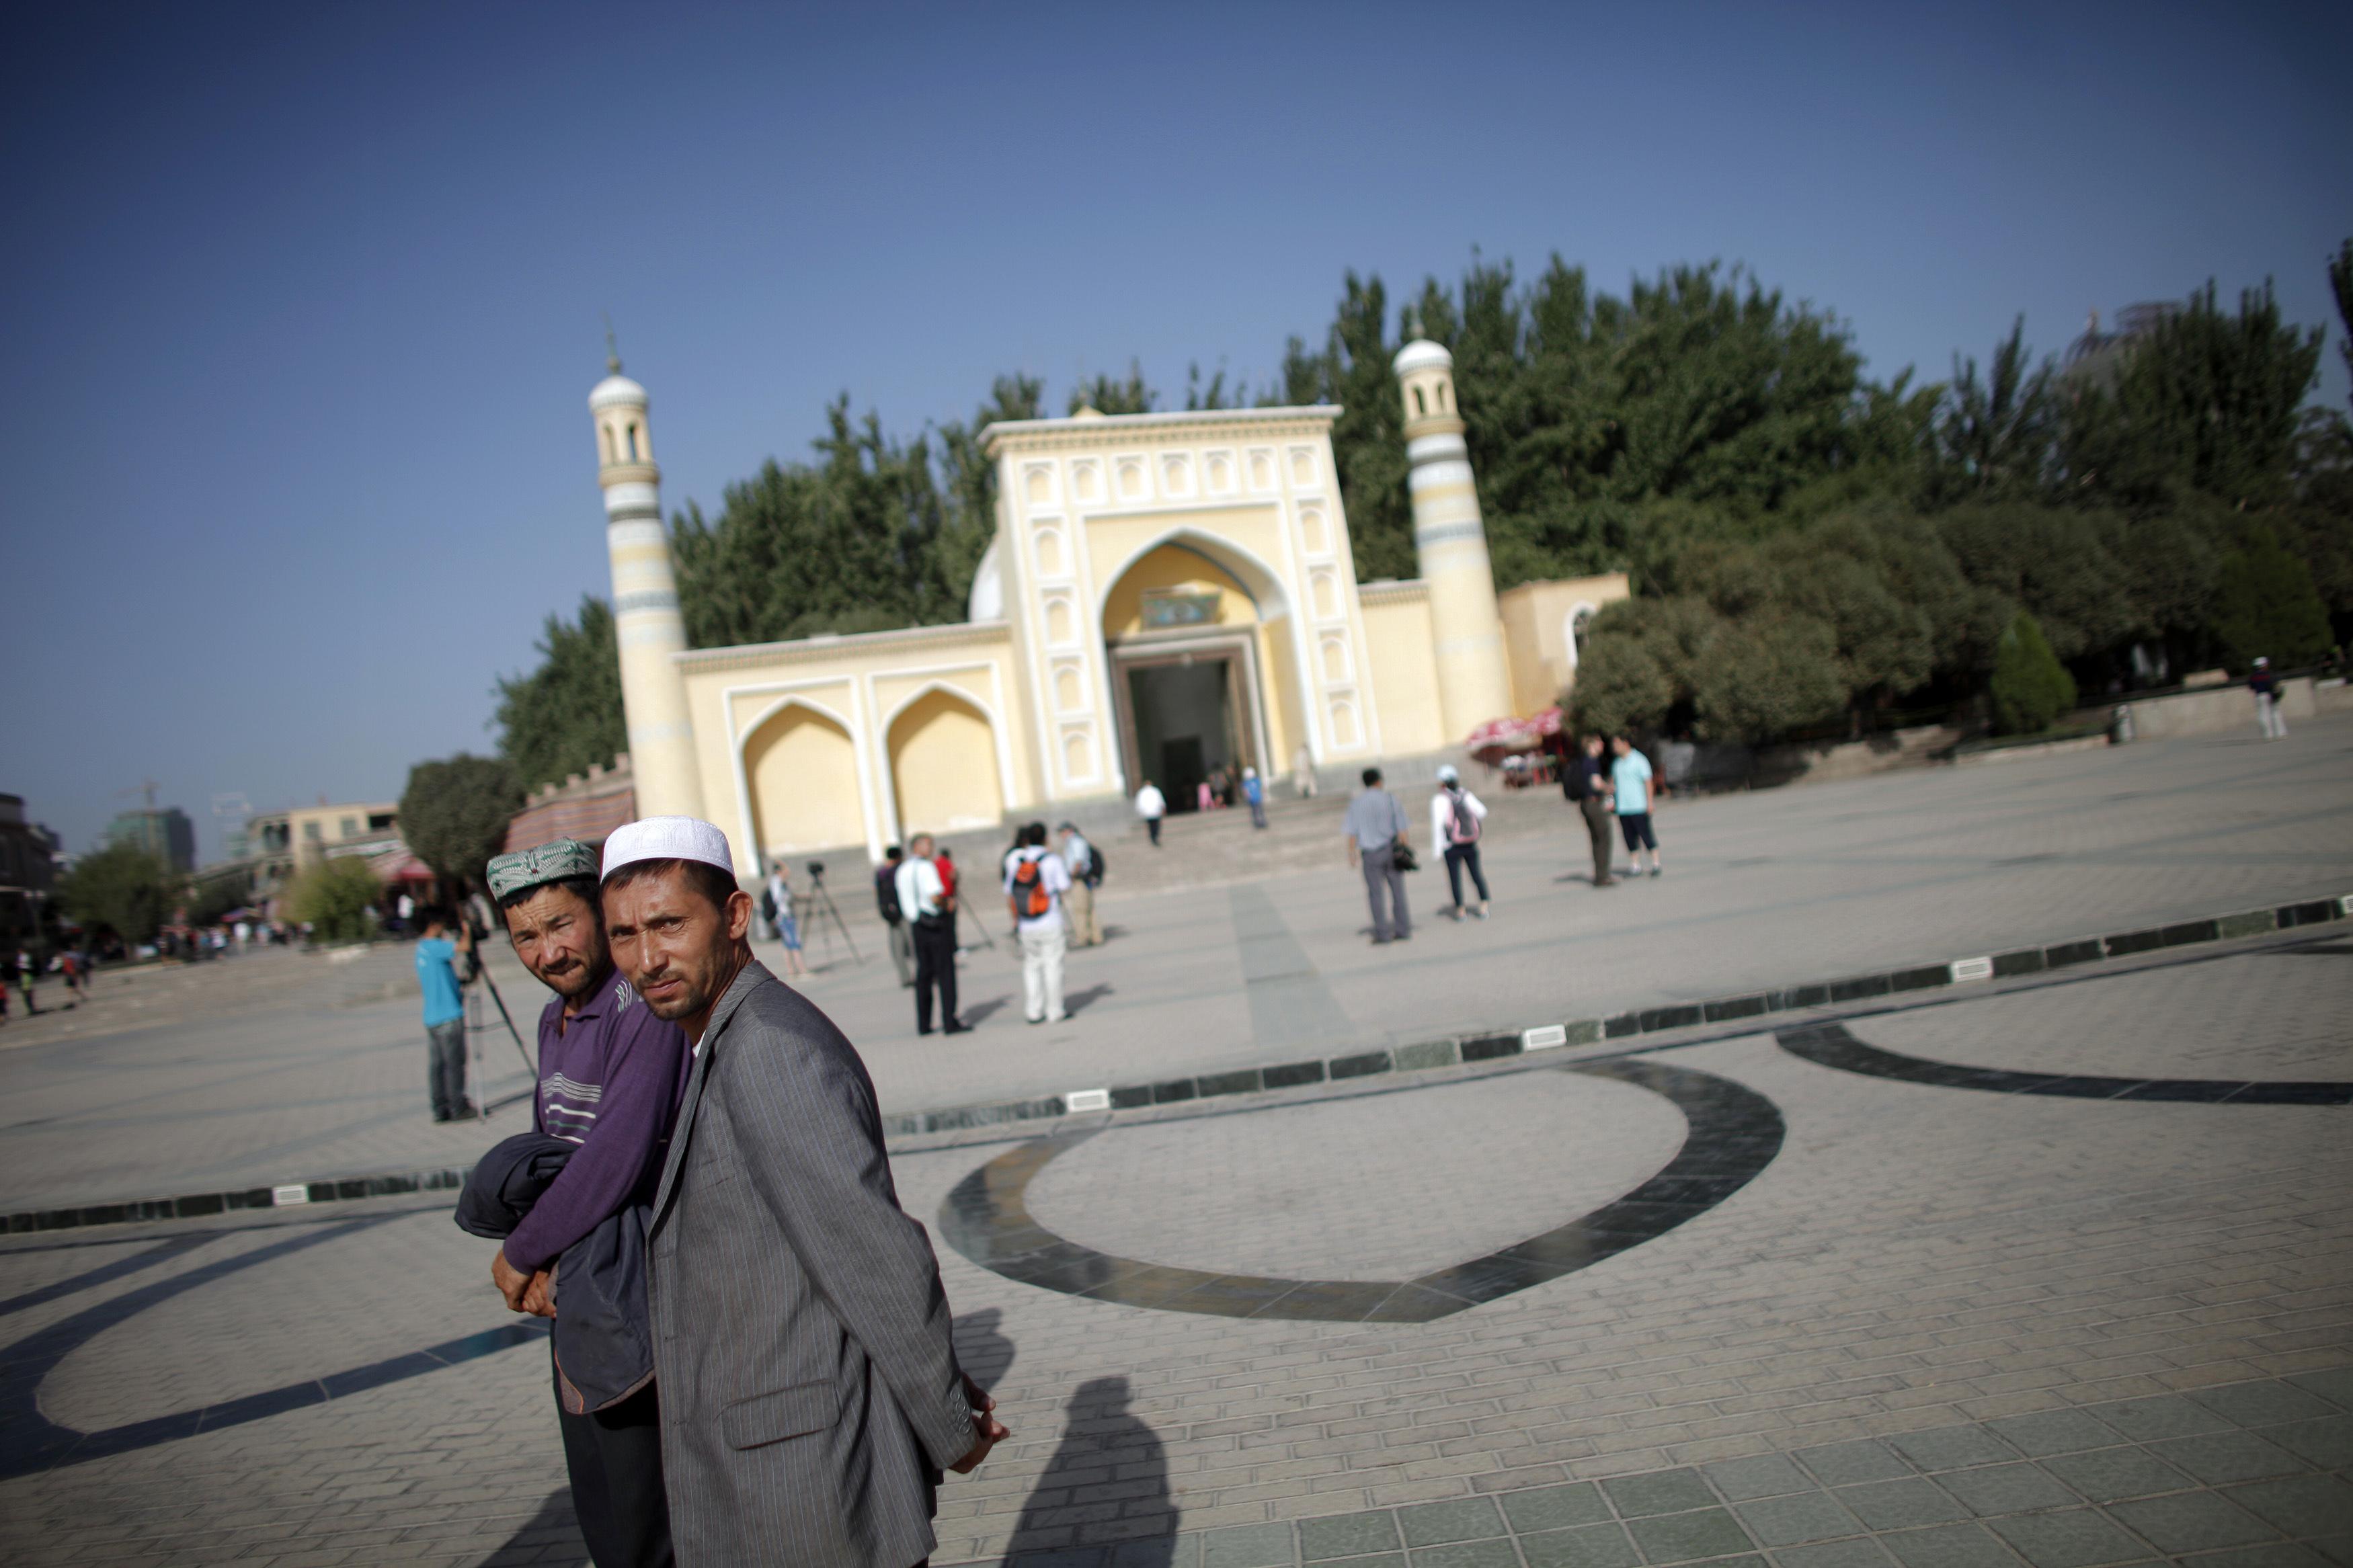 Ethnic Uighur men walk outside a mosque in Kashgar, Xinjiang province, on Aug. 3, 2011.